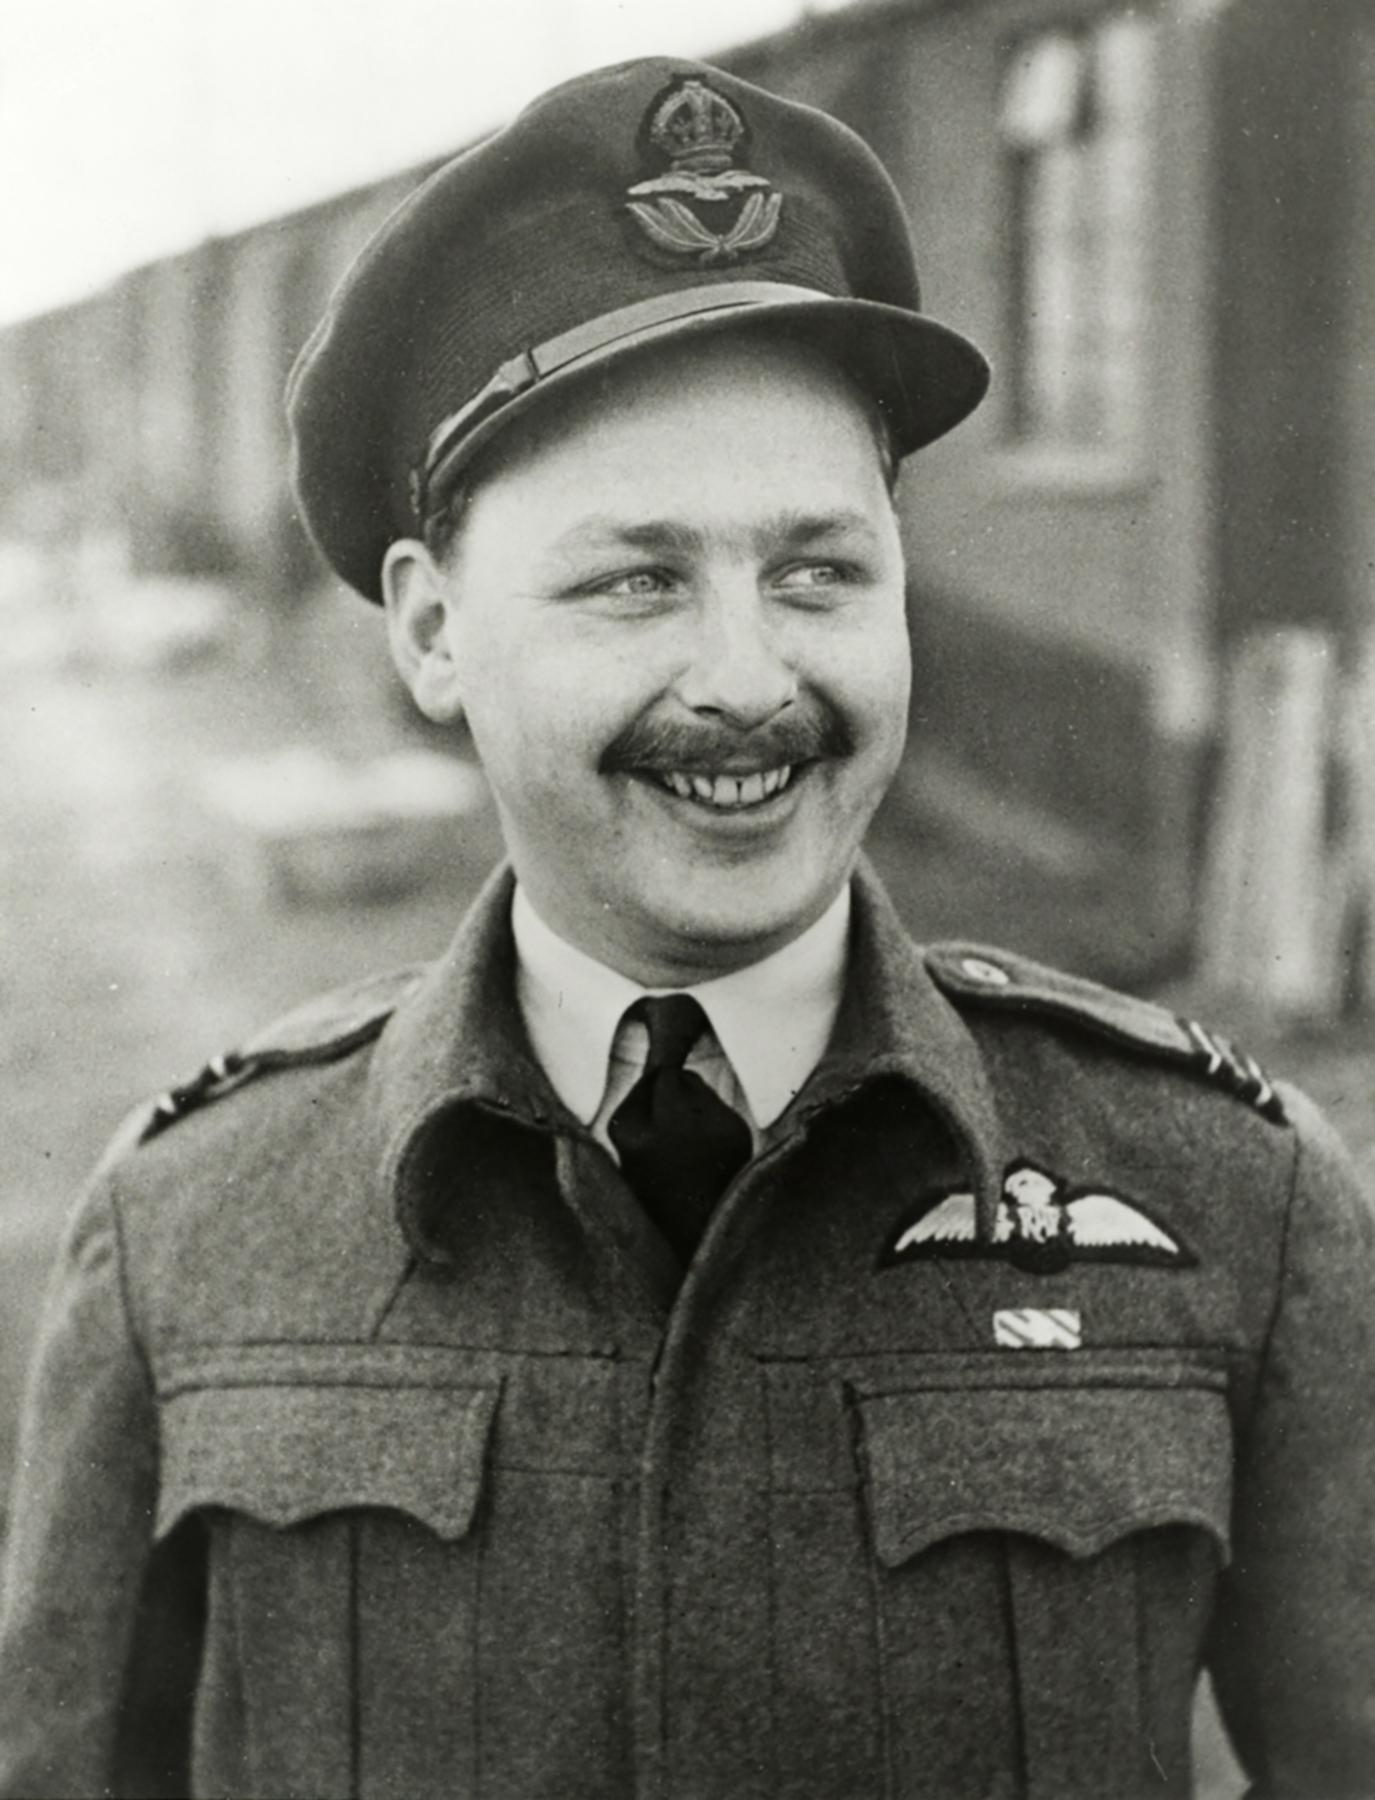 Aircrew RAF pilot John Freeborn 01